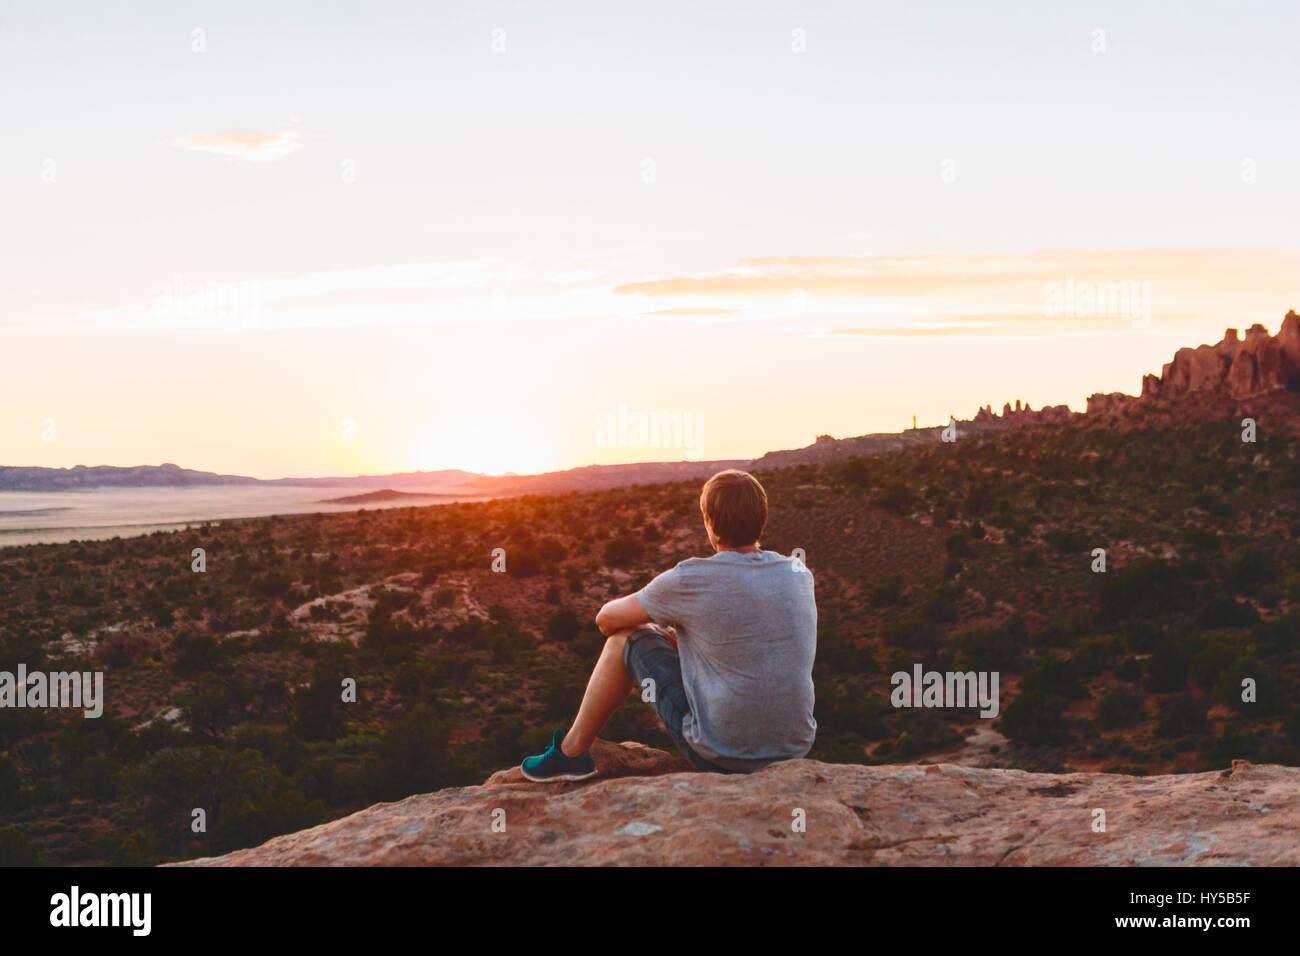 Stati Uniti d'America, Utah, Moab, uomo guardando a vista in Arches National Park Immagini Stock